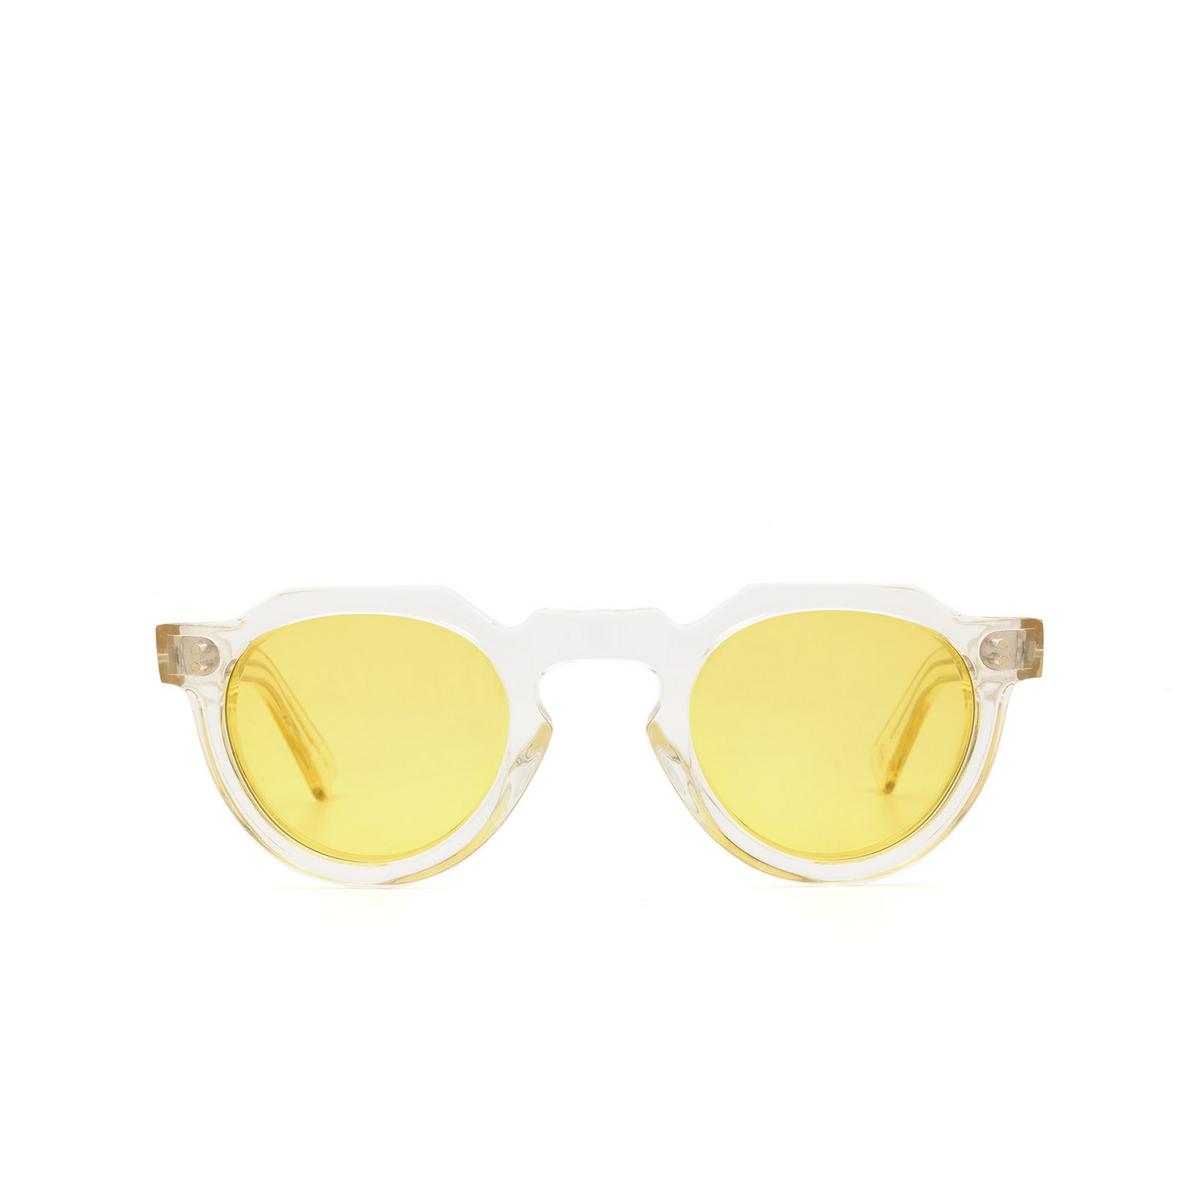 Lesca® Irregular Sunglasses: Crown Panto X Mia Burton color 21 - JOYFUL YELLOW - front view.